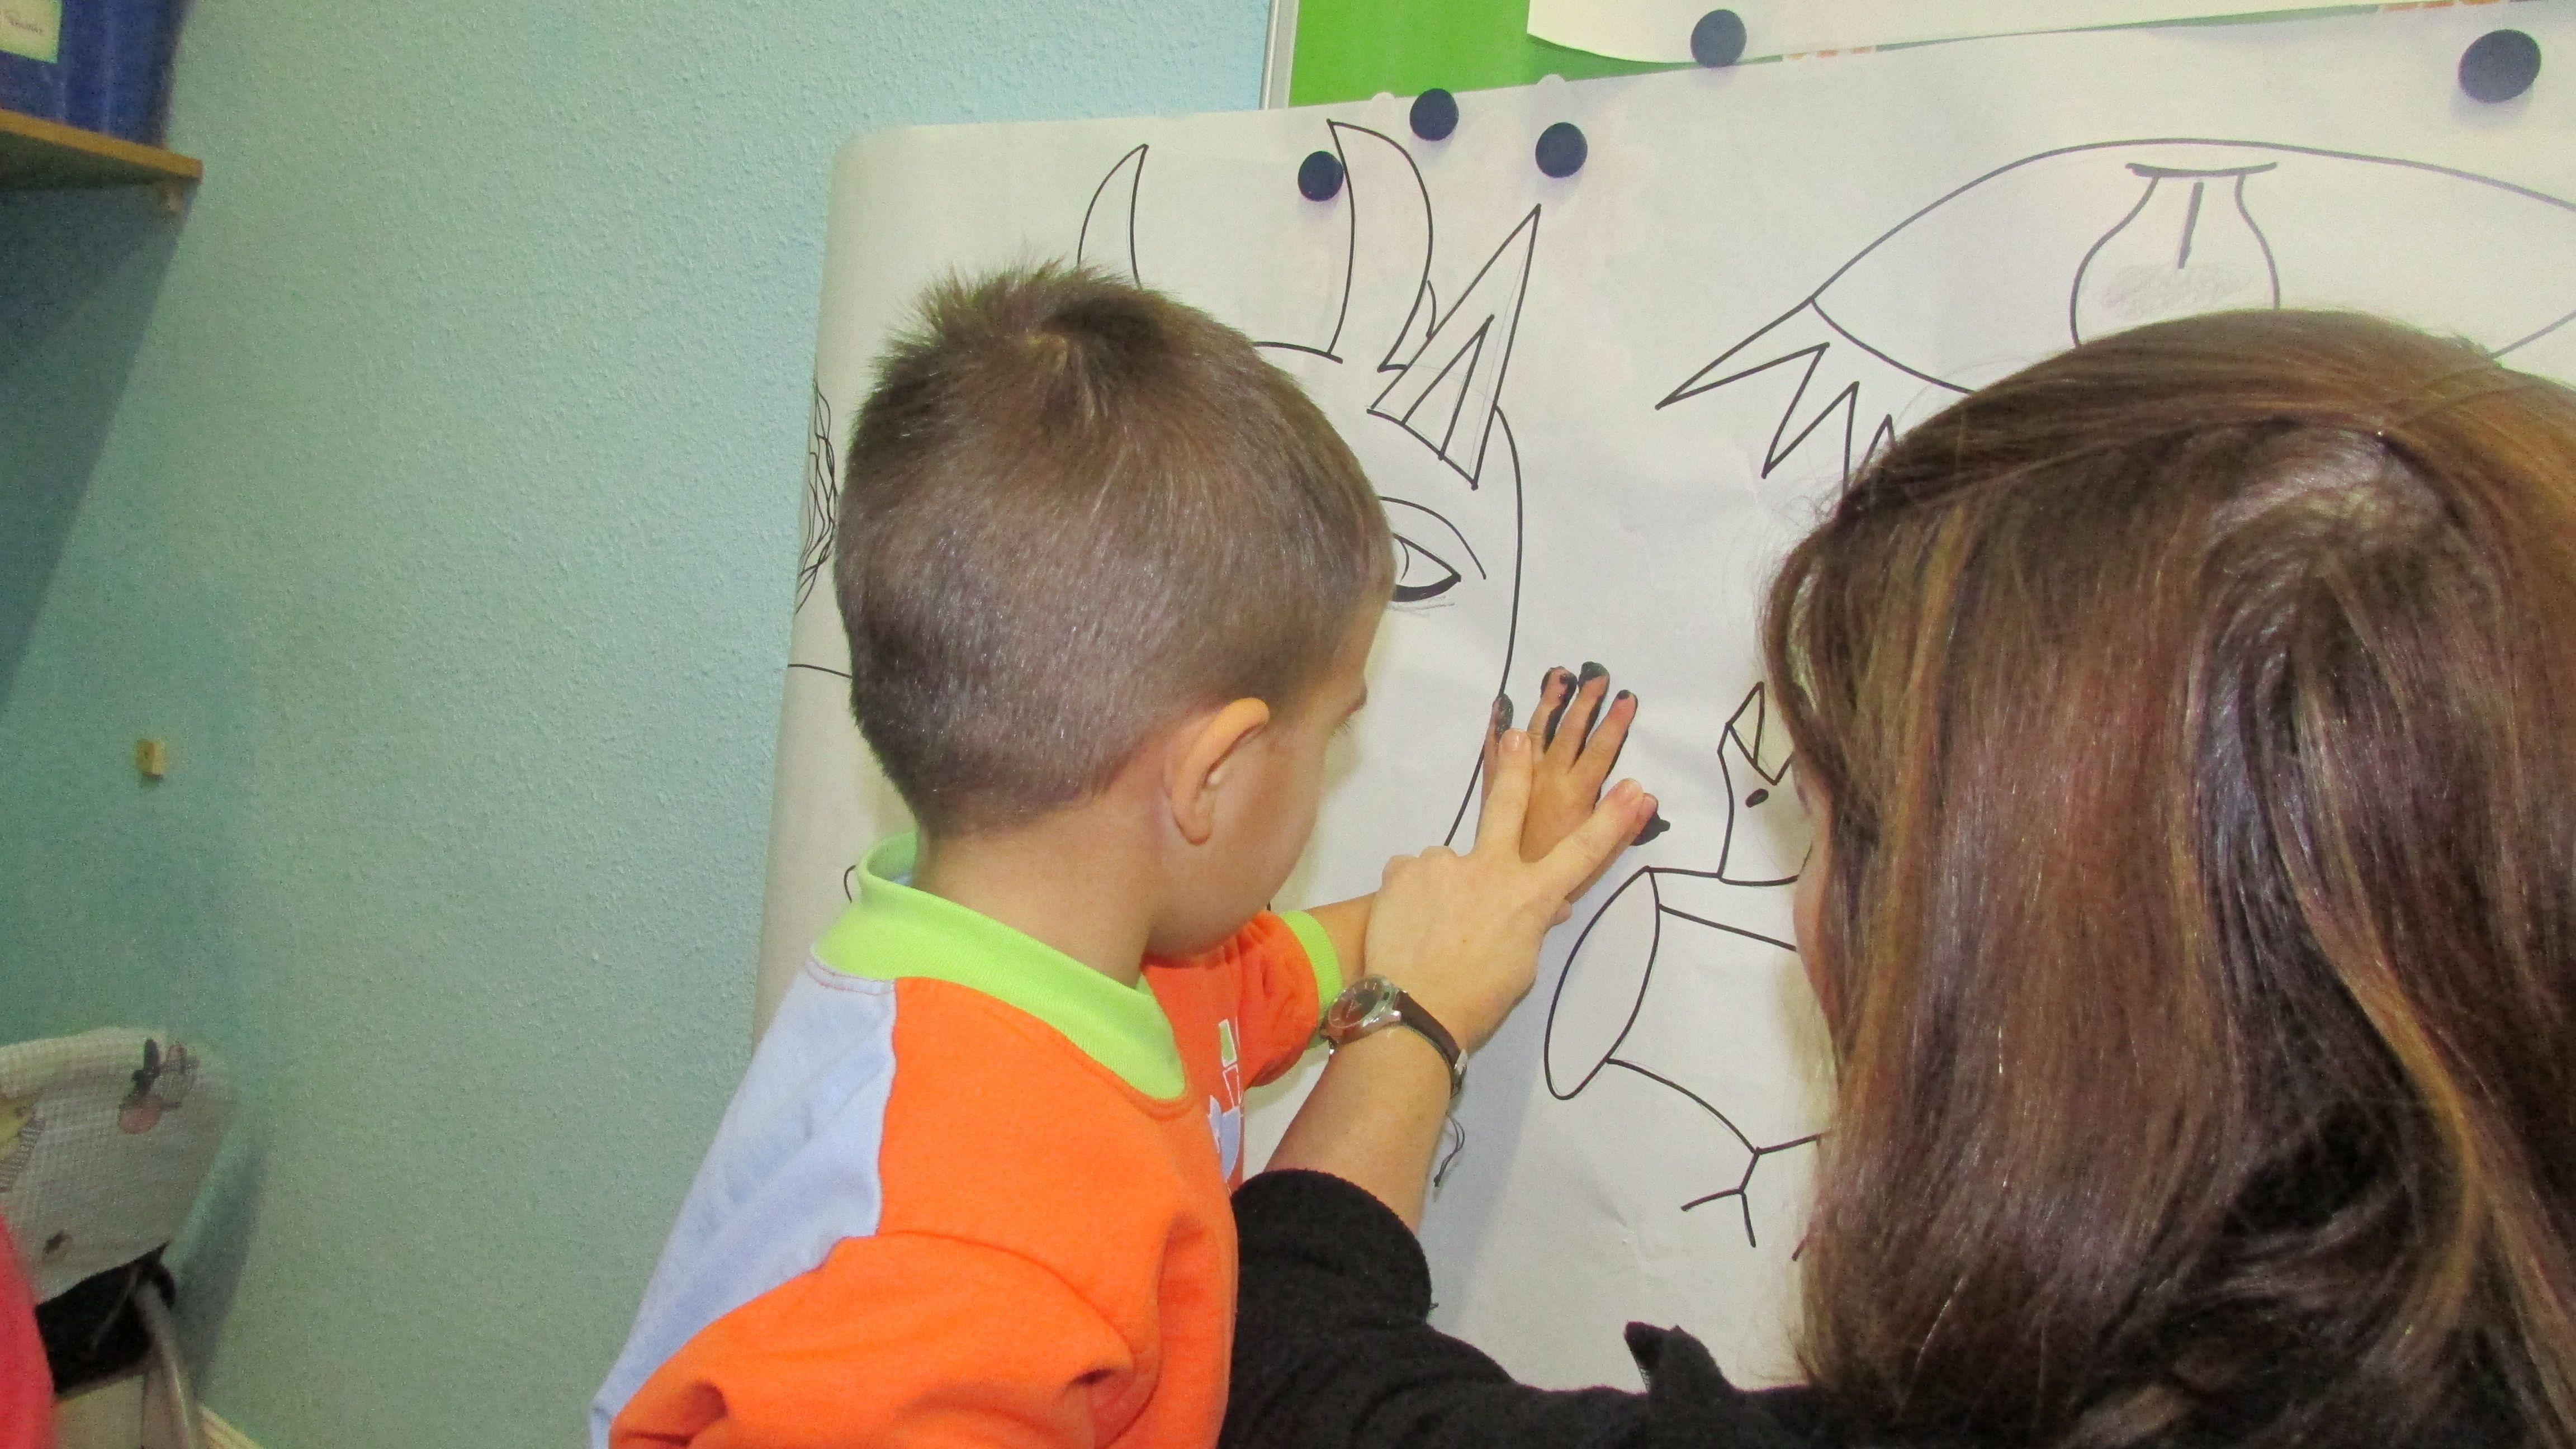 Escuela infantil Ciudad Lineal, Madrid